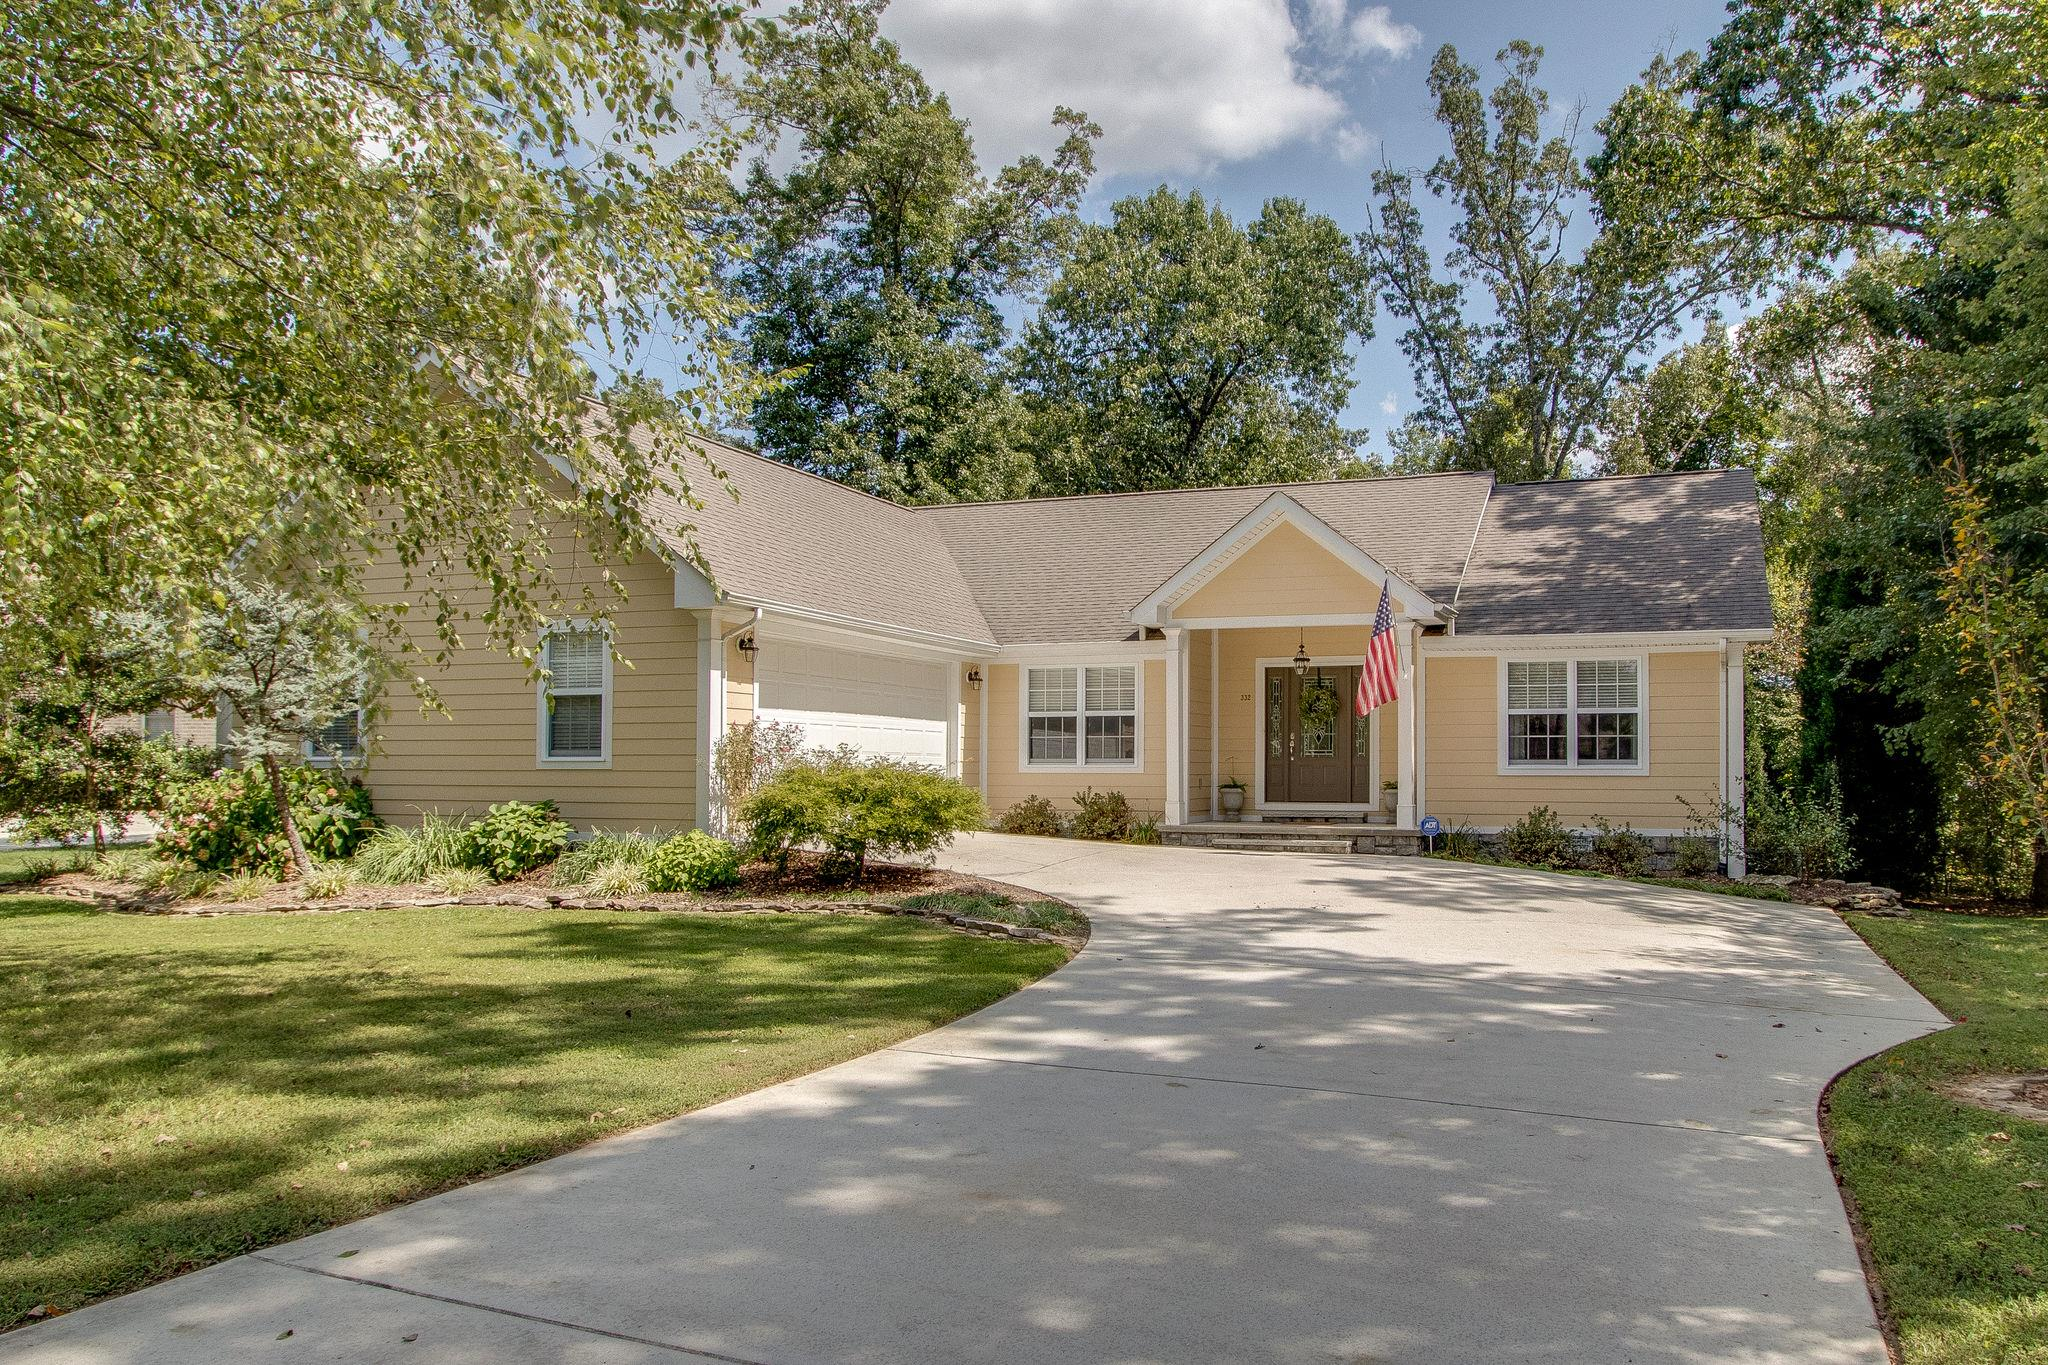 332 E Deer Creek Dr, Crossville, TN 38571 - Crossville, TN real estate listing